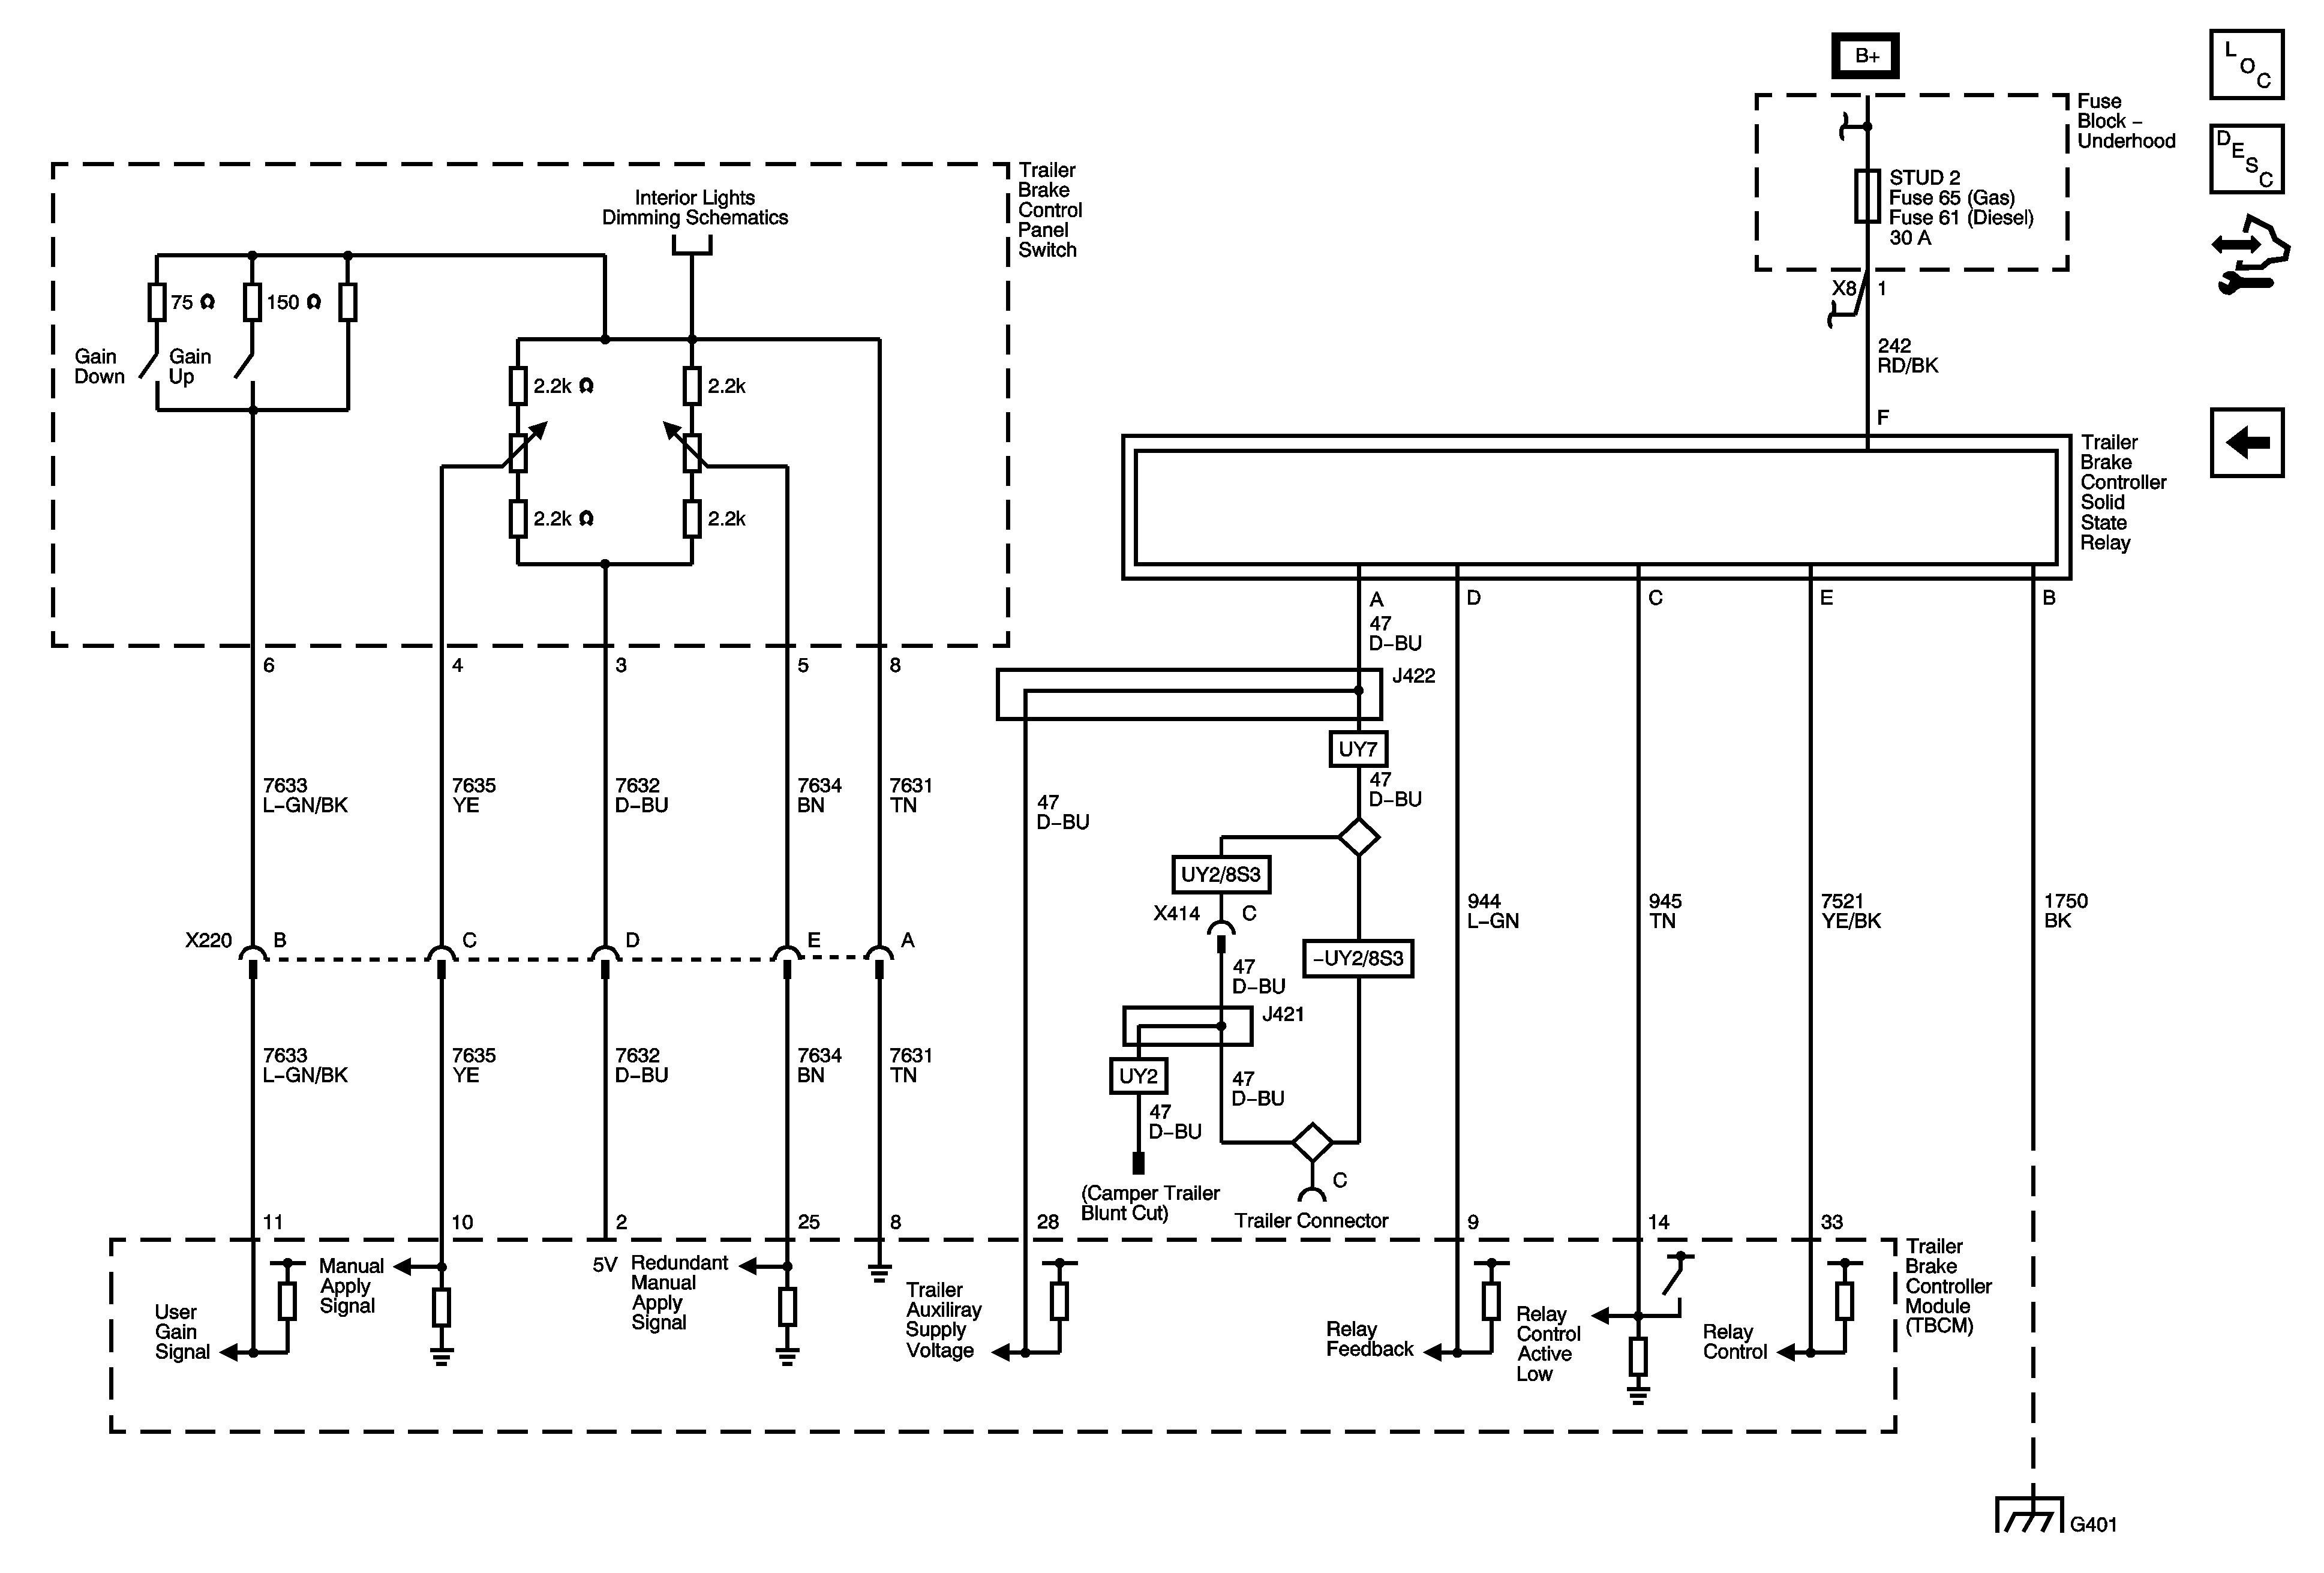 Wiring Diagram for Redarc Electric Brake Controller Inspirationa Trailer Brake Controller Wiring Diagram Lovely Chevy Brake